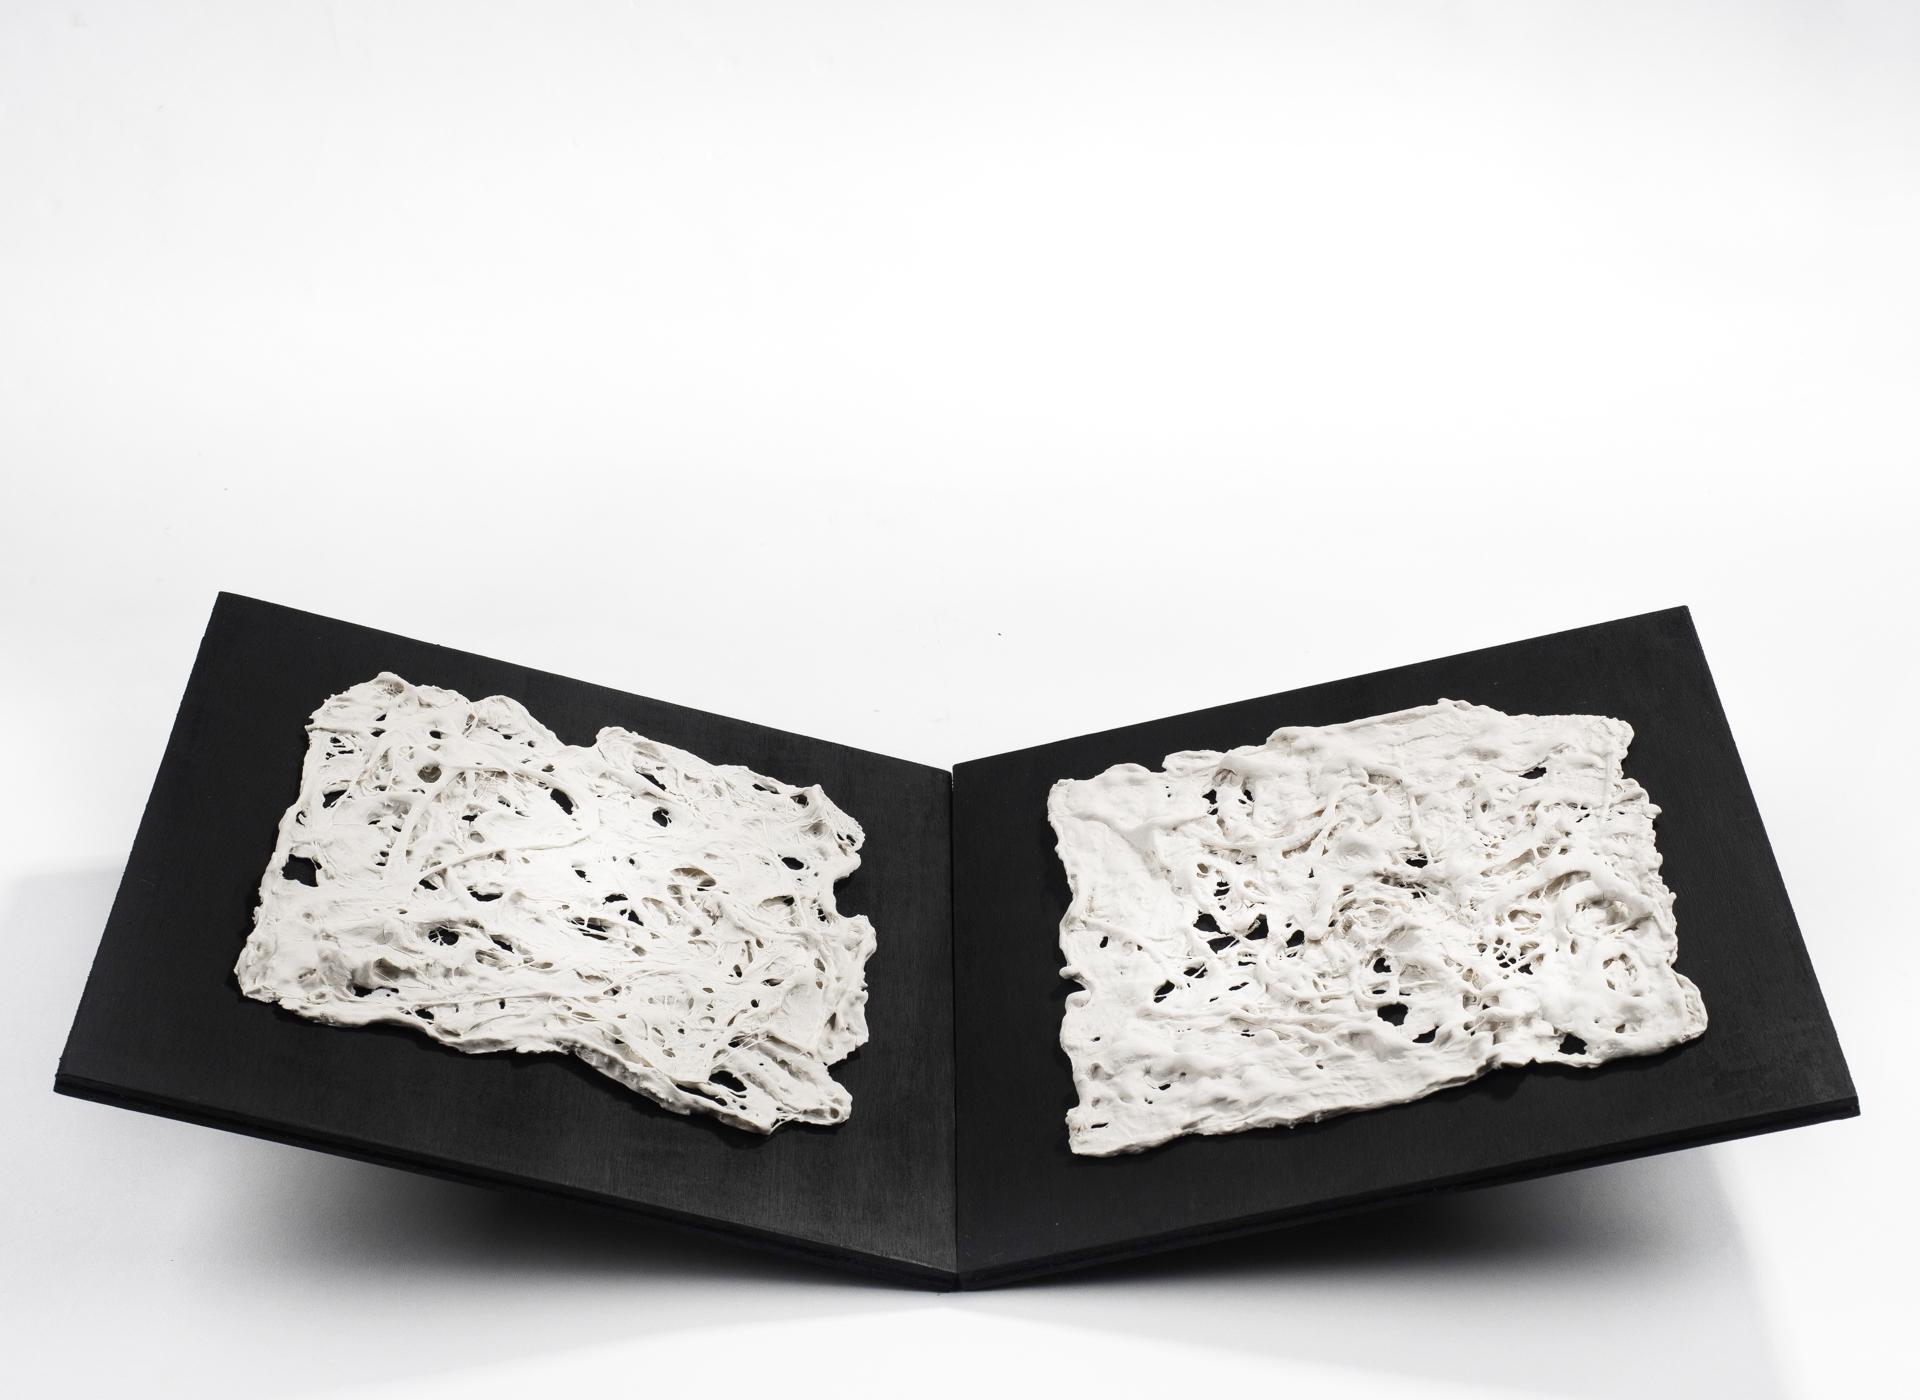 Porcelain, organic materials - 2017